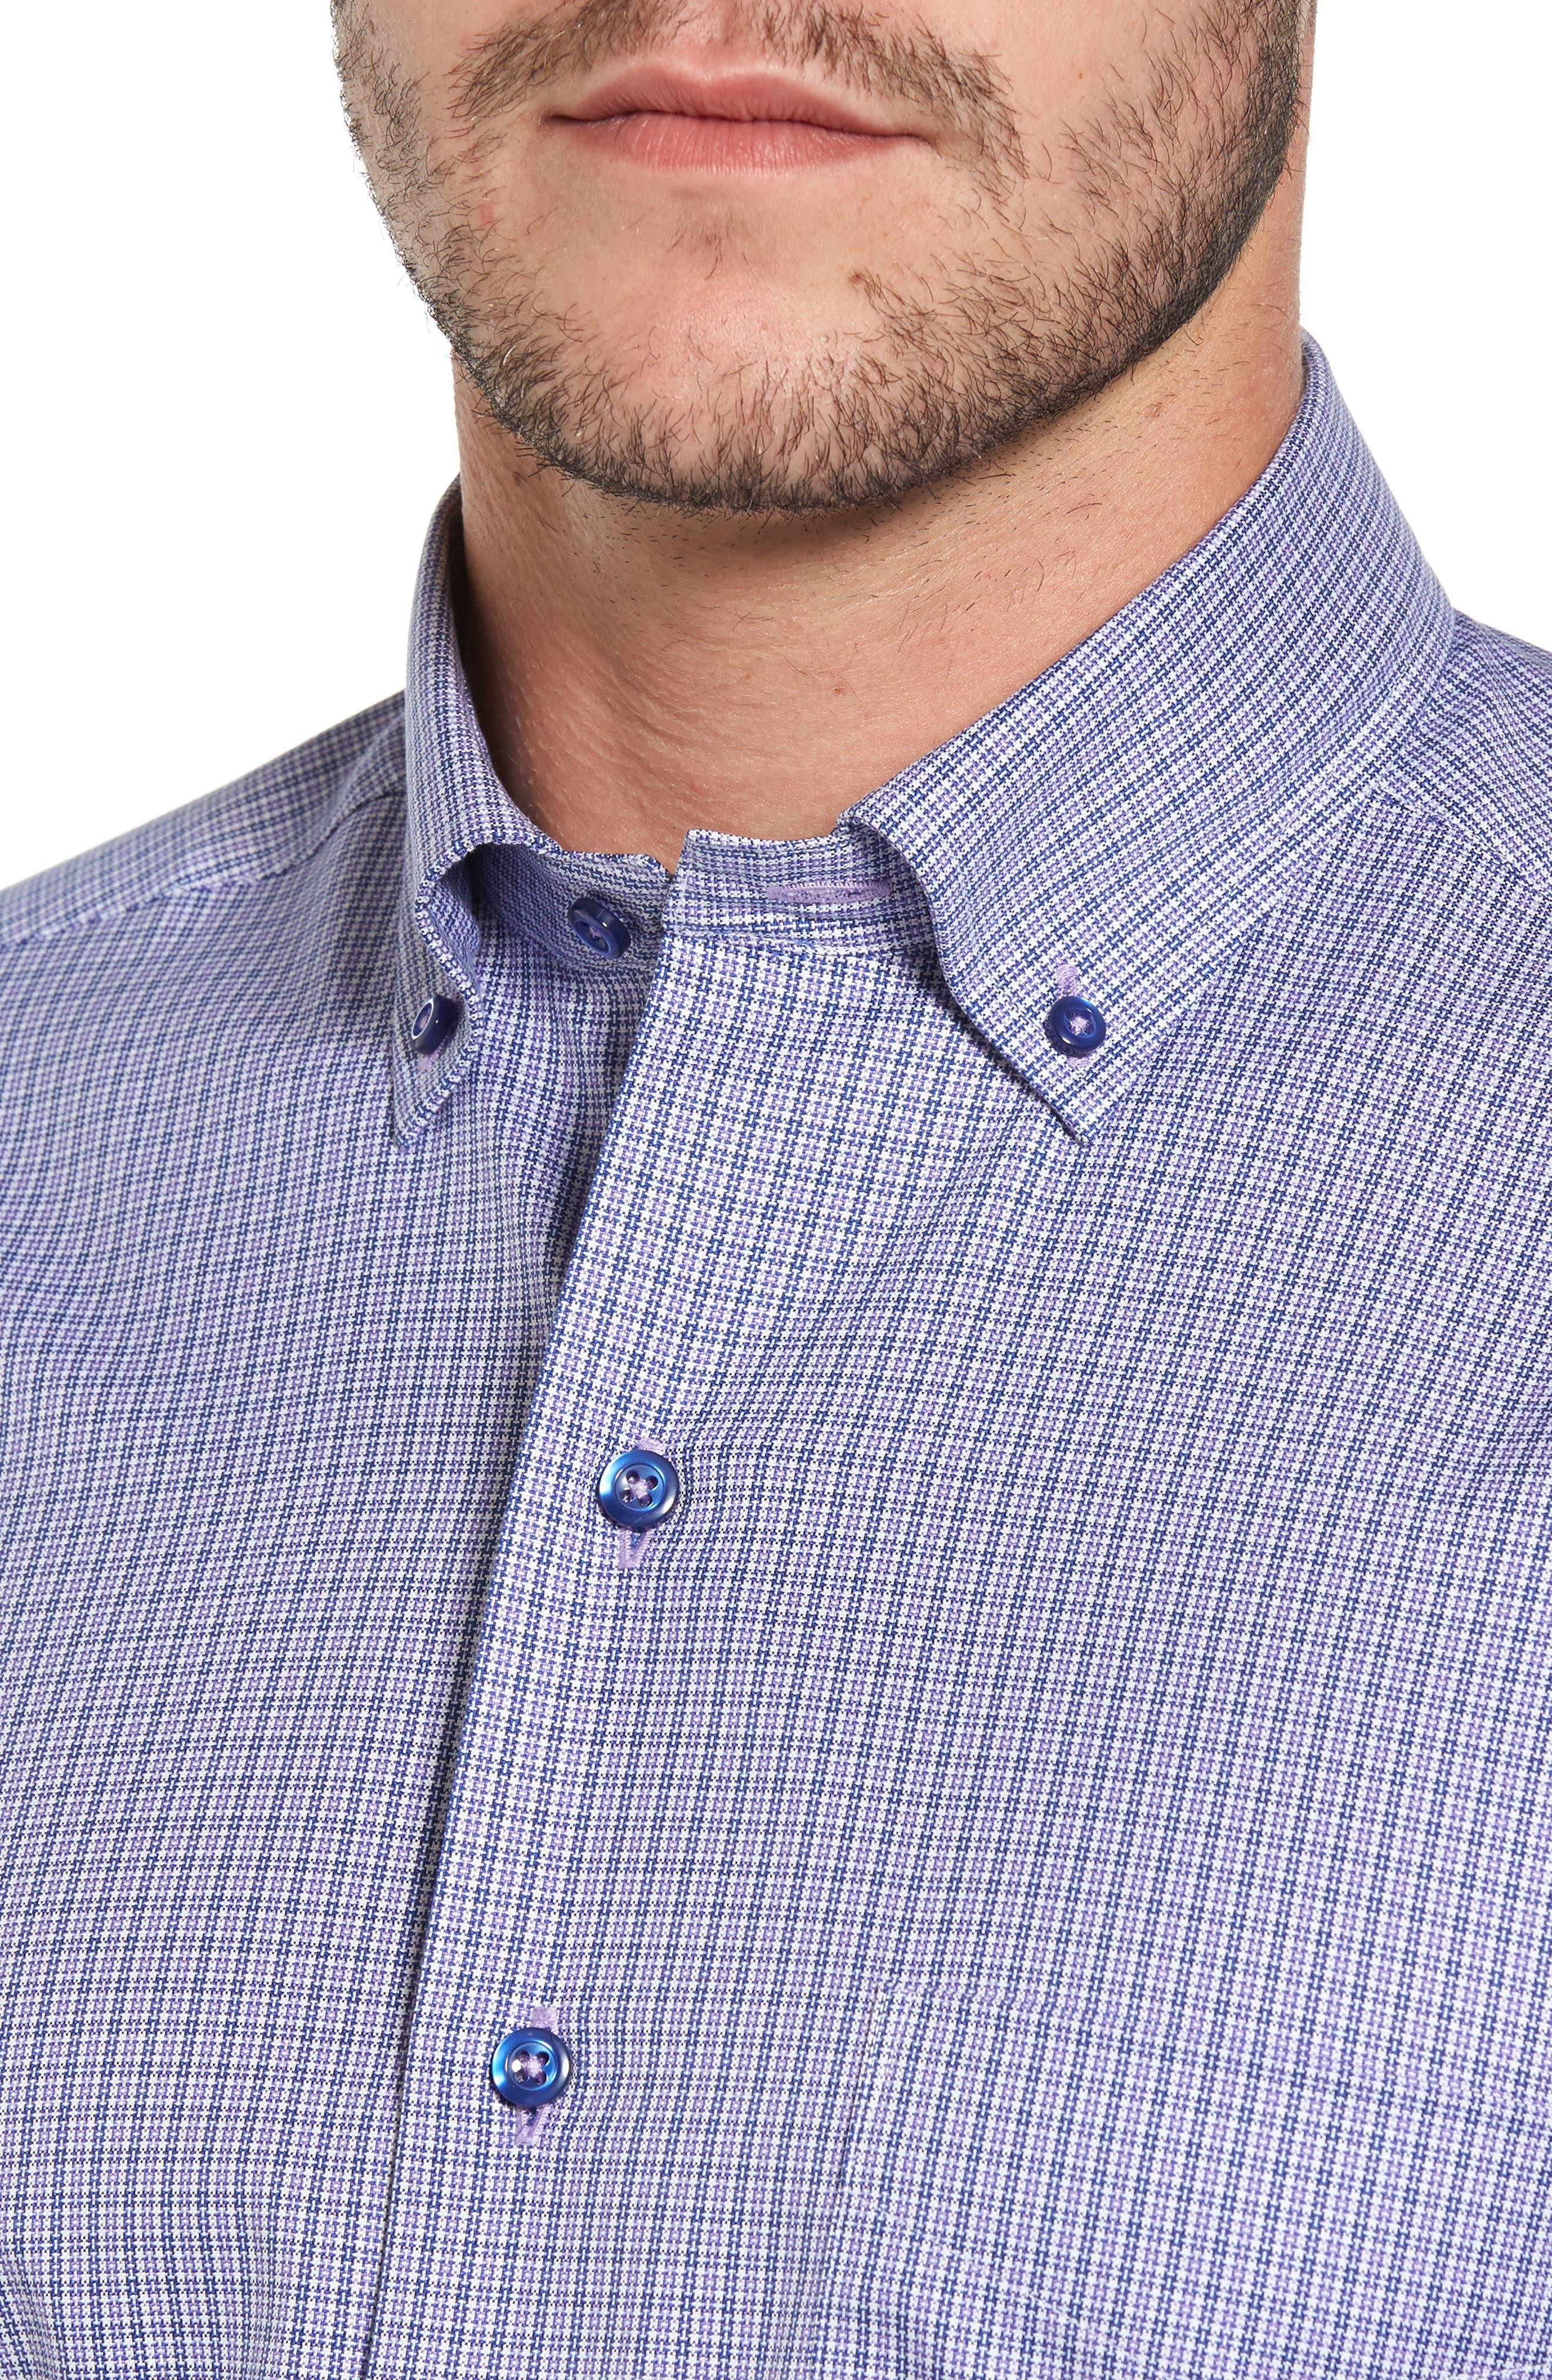 Microcheck Sport Shirt,                             Alternate thumbnail 4, color,                             431